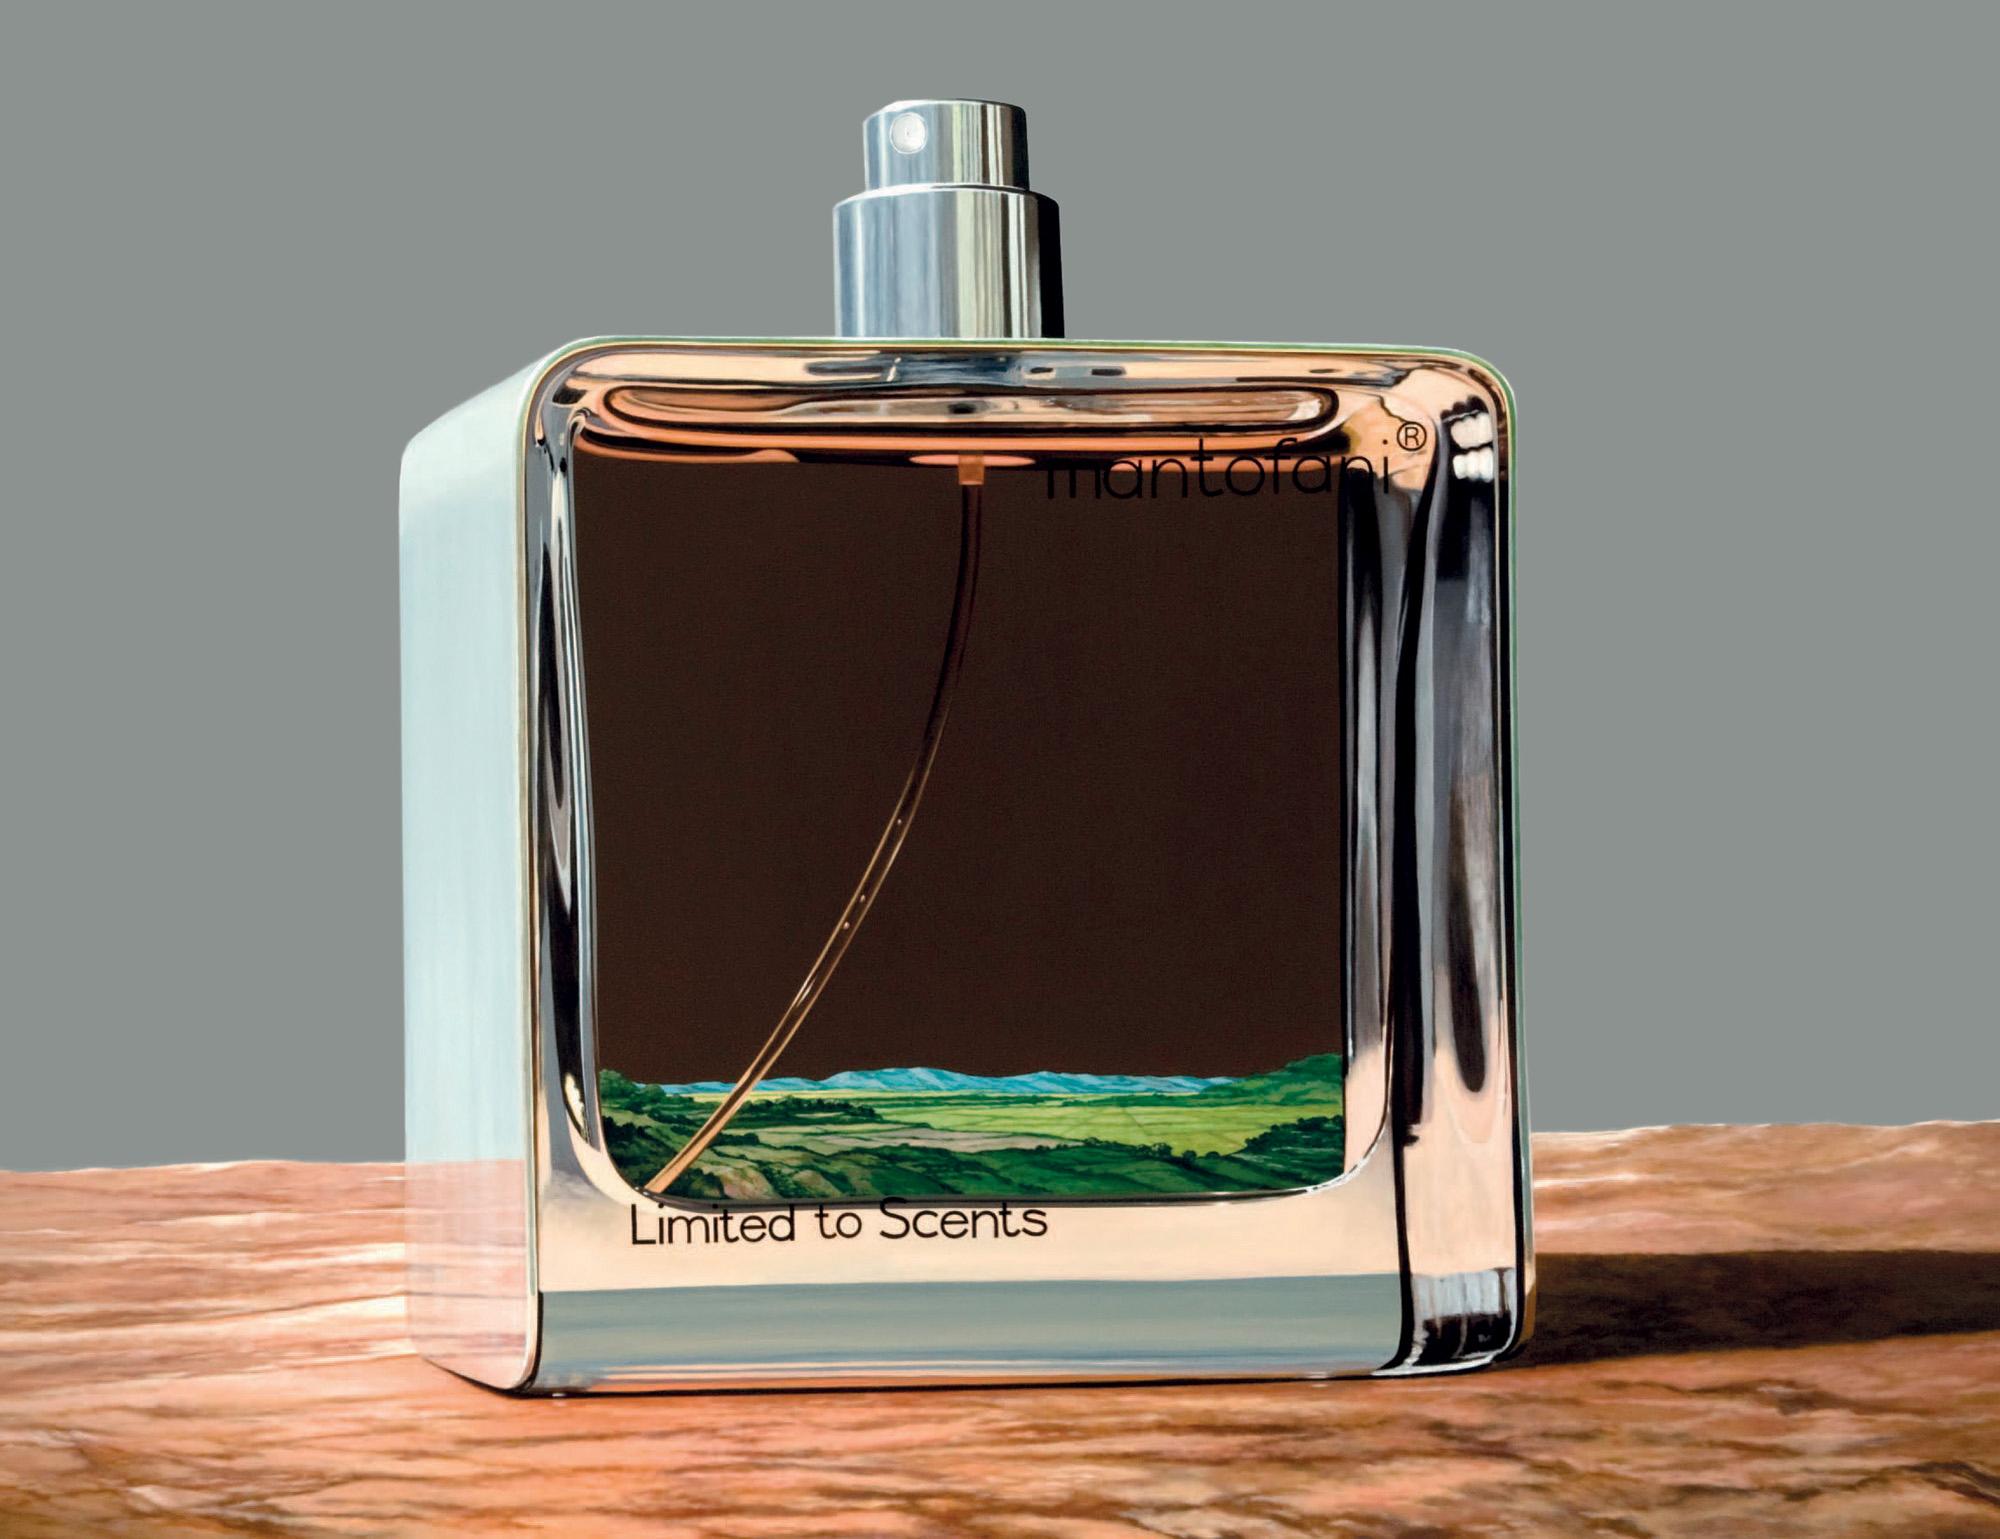 Sebatas Aroma (Limited to scents)